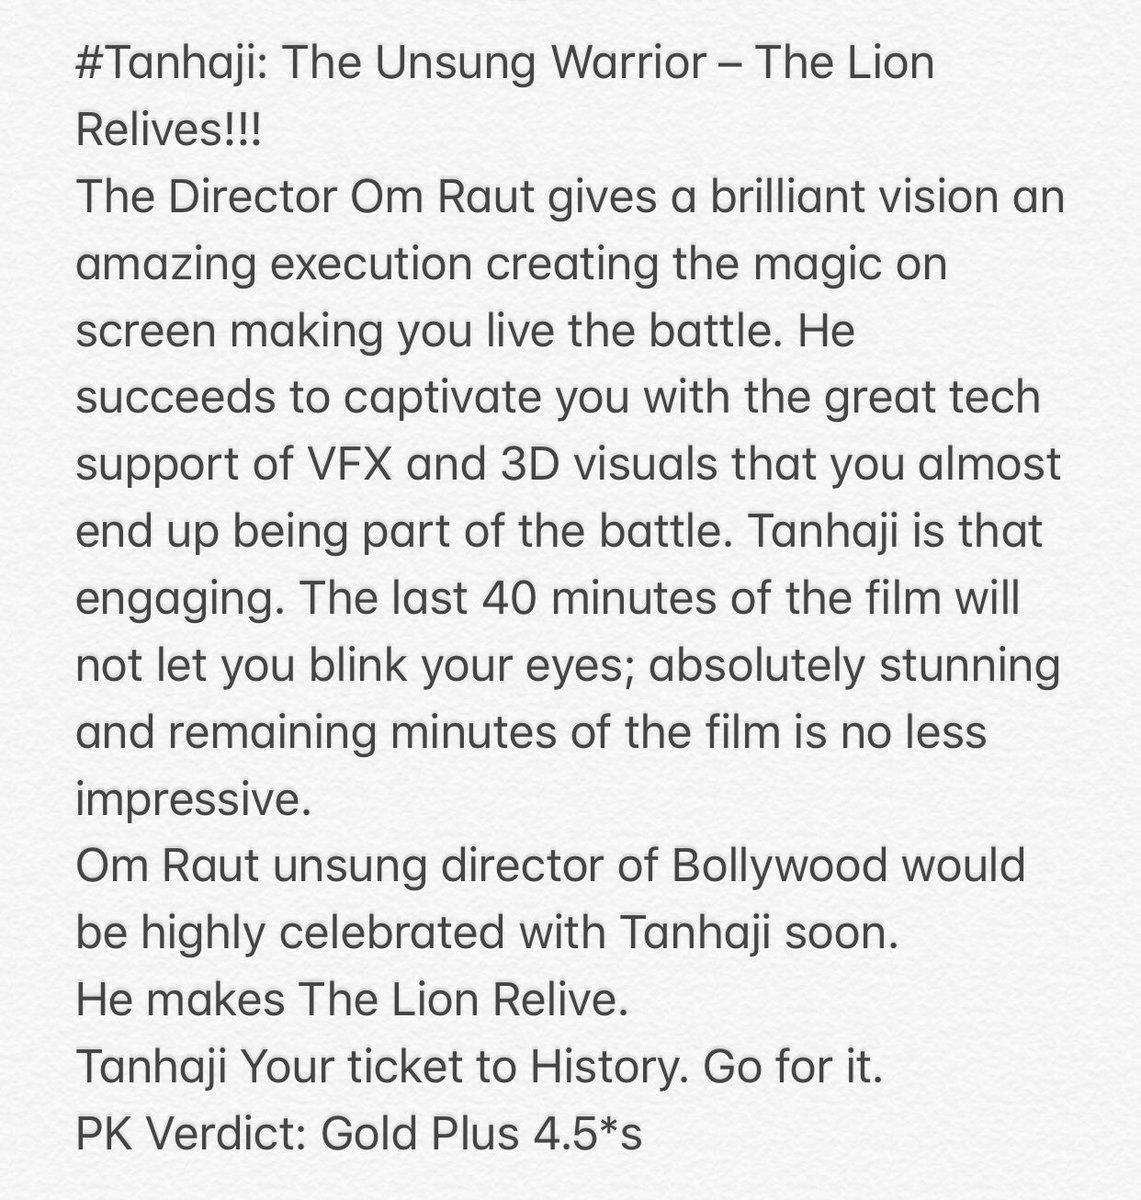 #TanhajiReview The Lion Relives!!! Read more 👇 PK Verdict:GoldPlus4.5*s @ADFFilms @ajaydevgn @itsKajolD @SharadK7 @Universal_PR @TSeries @omraut @AjayAtulOnline @itsBhushanKumar #Saifalikhan @SachetParampara @ShankarEhsanLoy